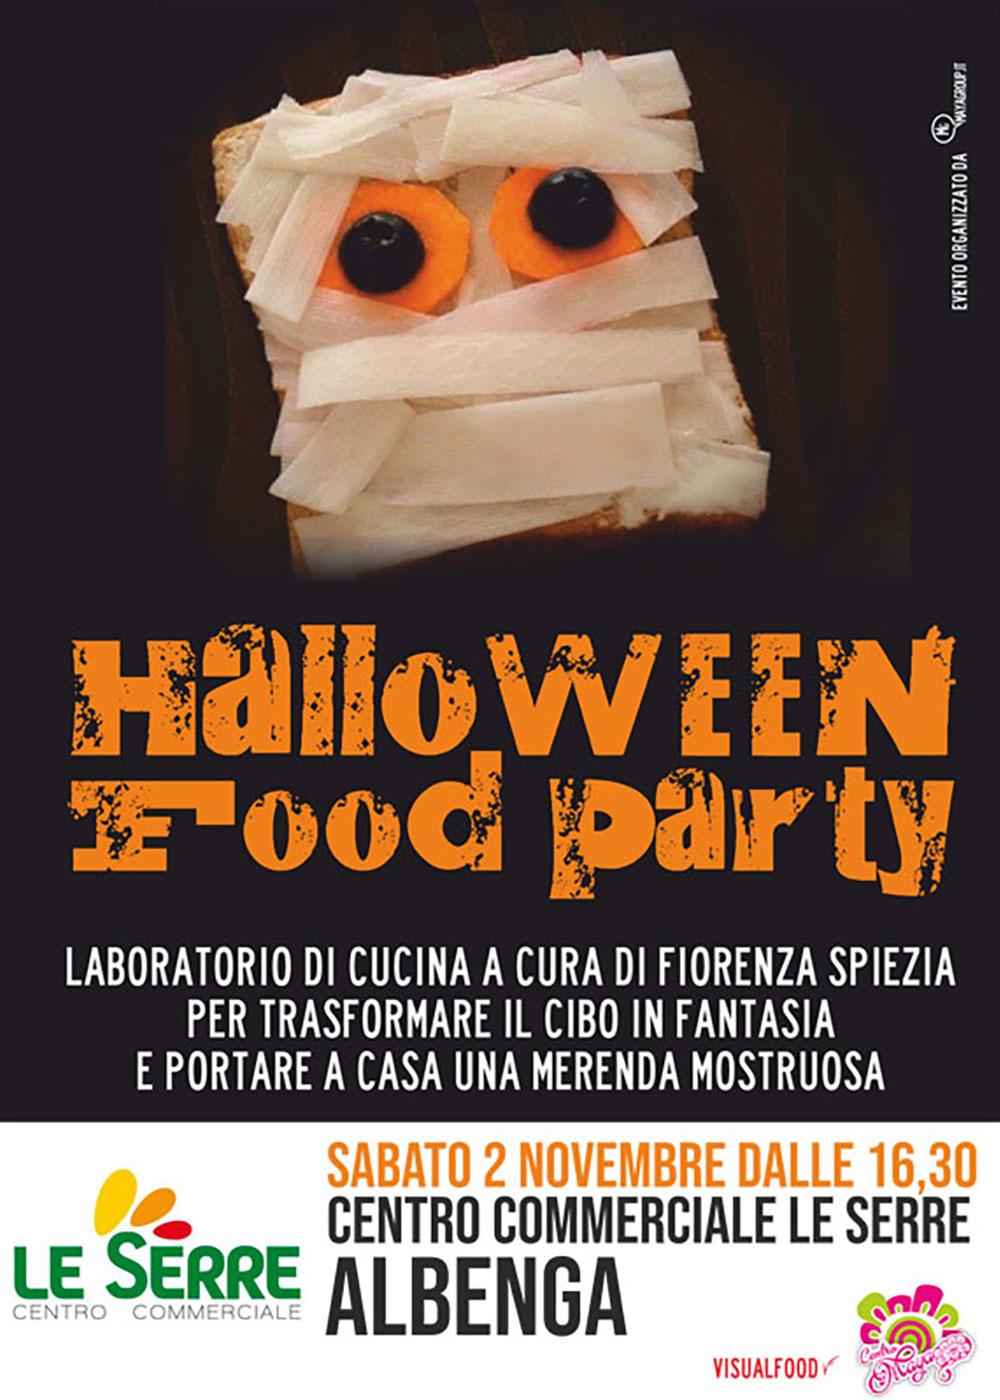 2 novembre Halloween Food Party